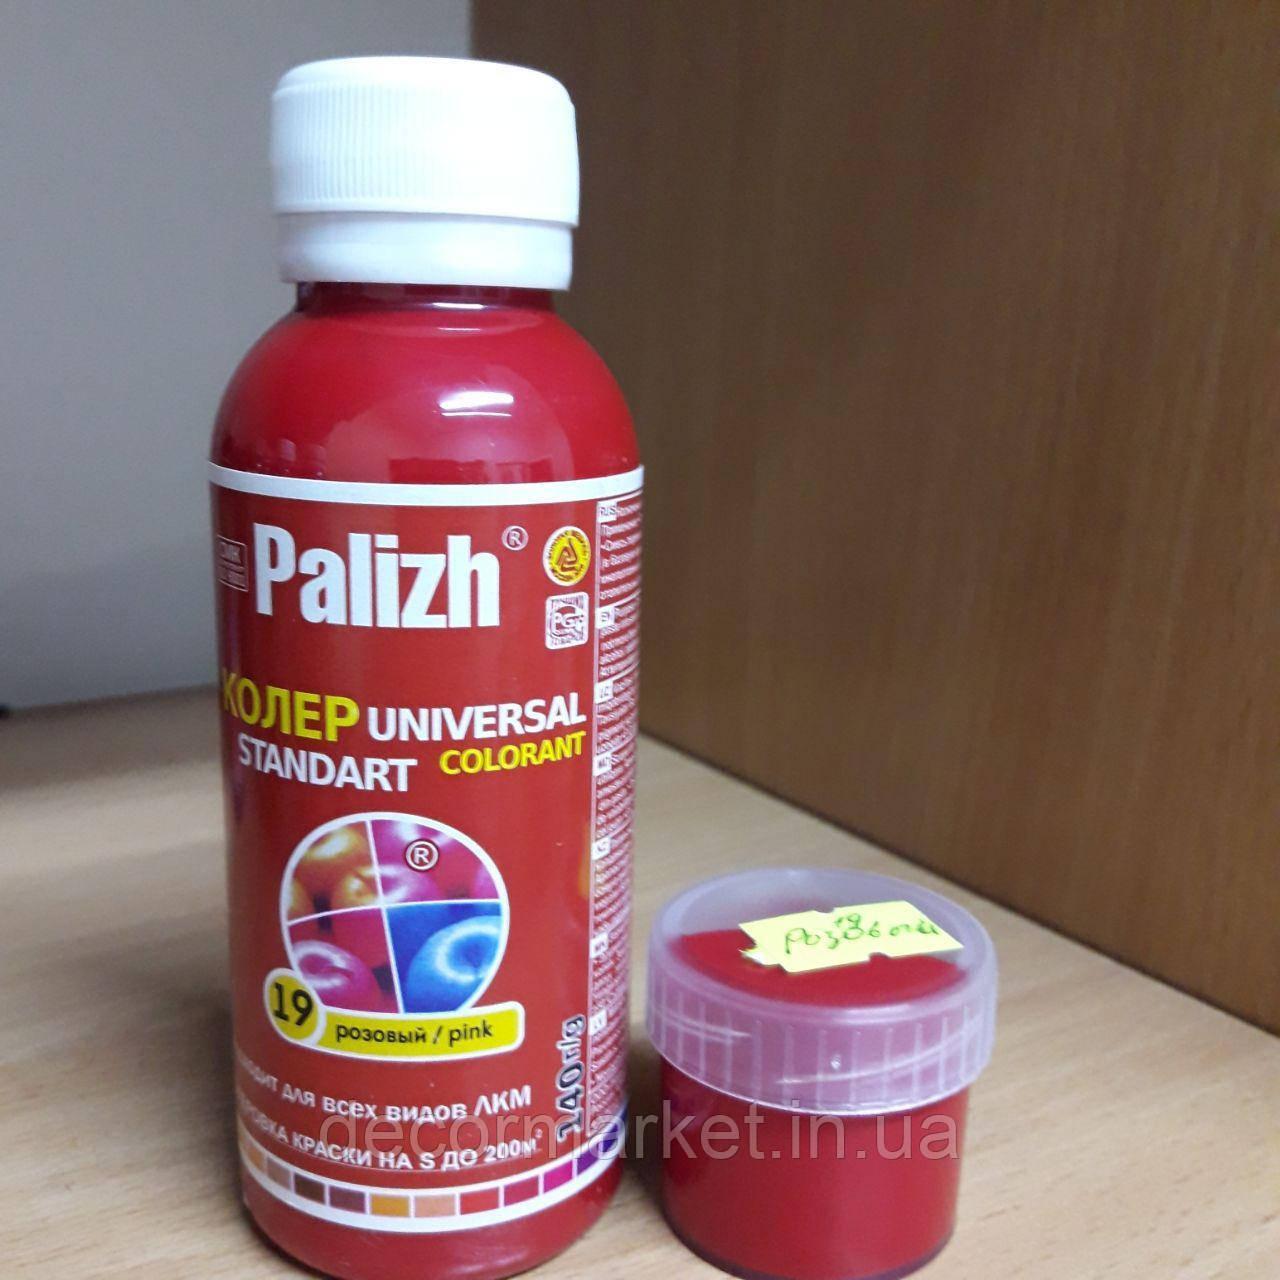 Колер PALIGH розовый 140мл